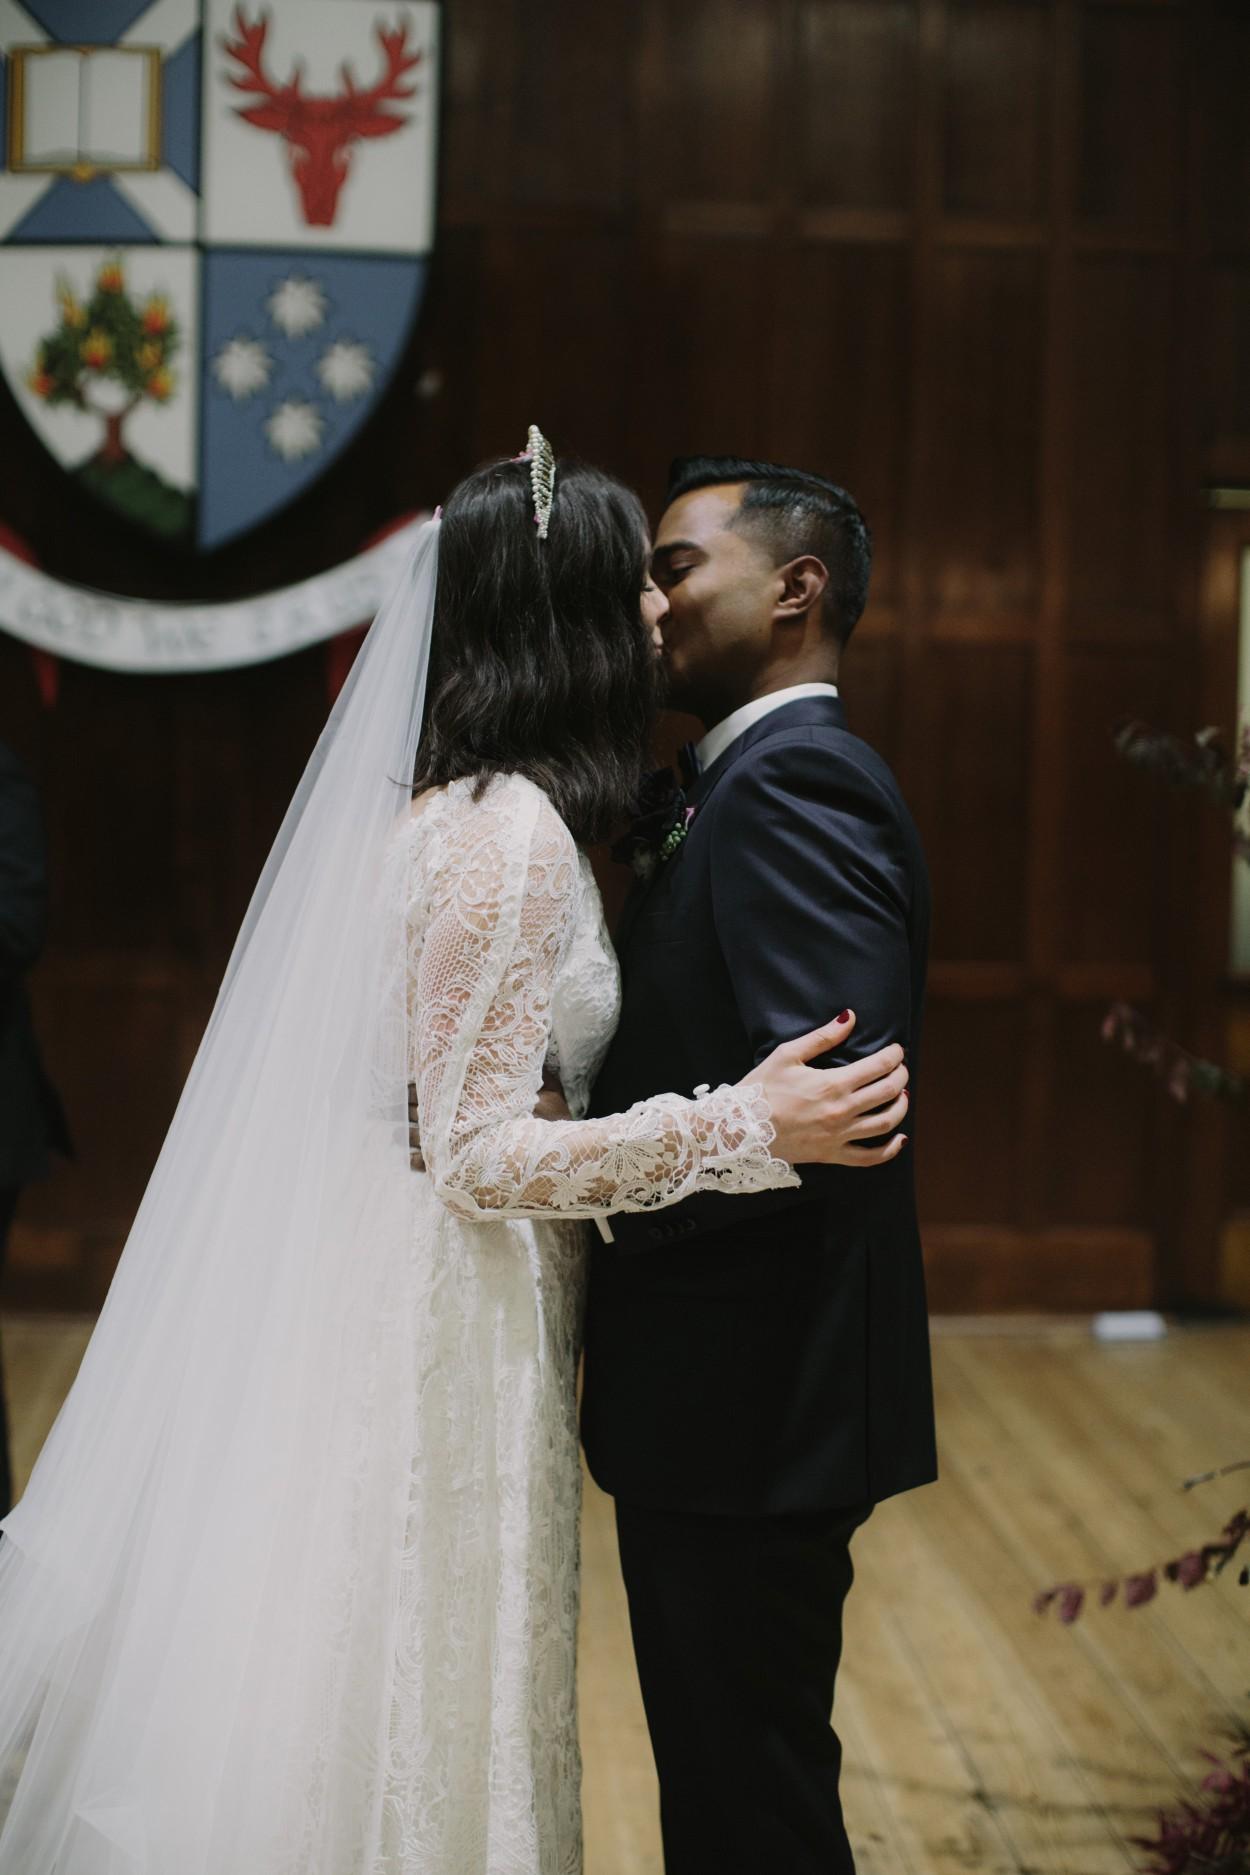 I-Got-You-Babe-Weddings-The-035George-Ballroom-St-Kilda-Wedding-Amy-Abhi.jpg